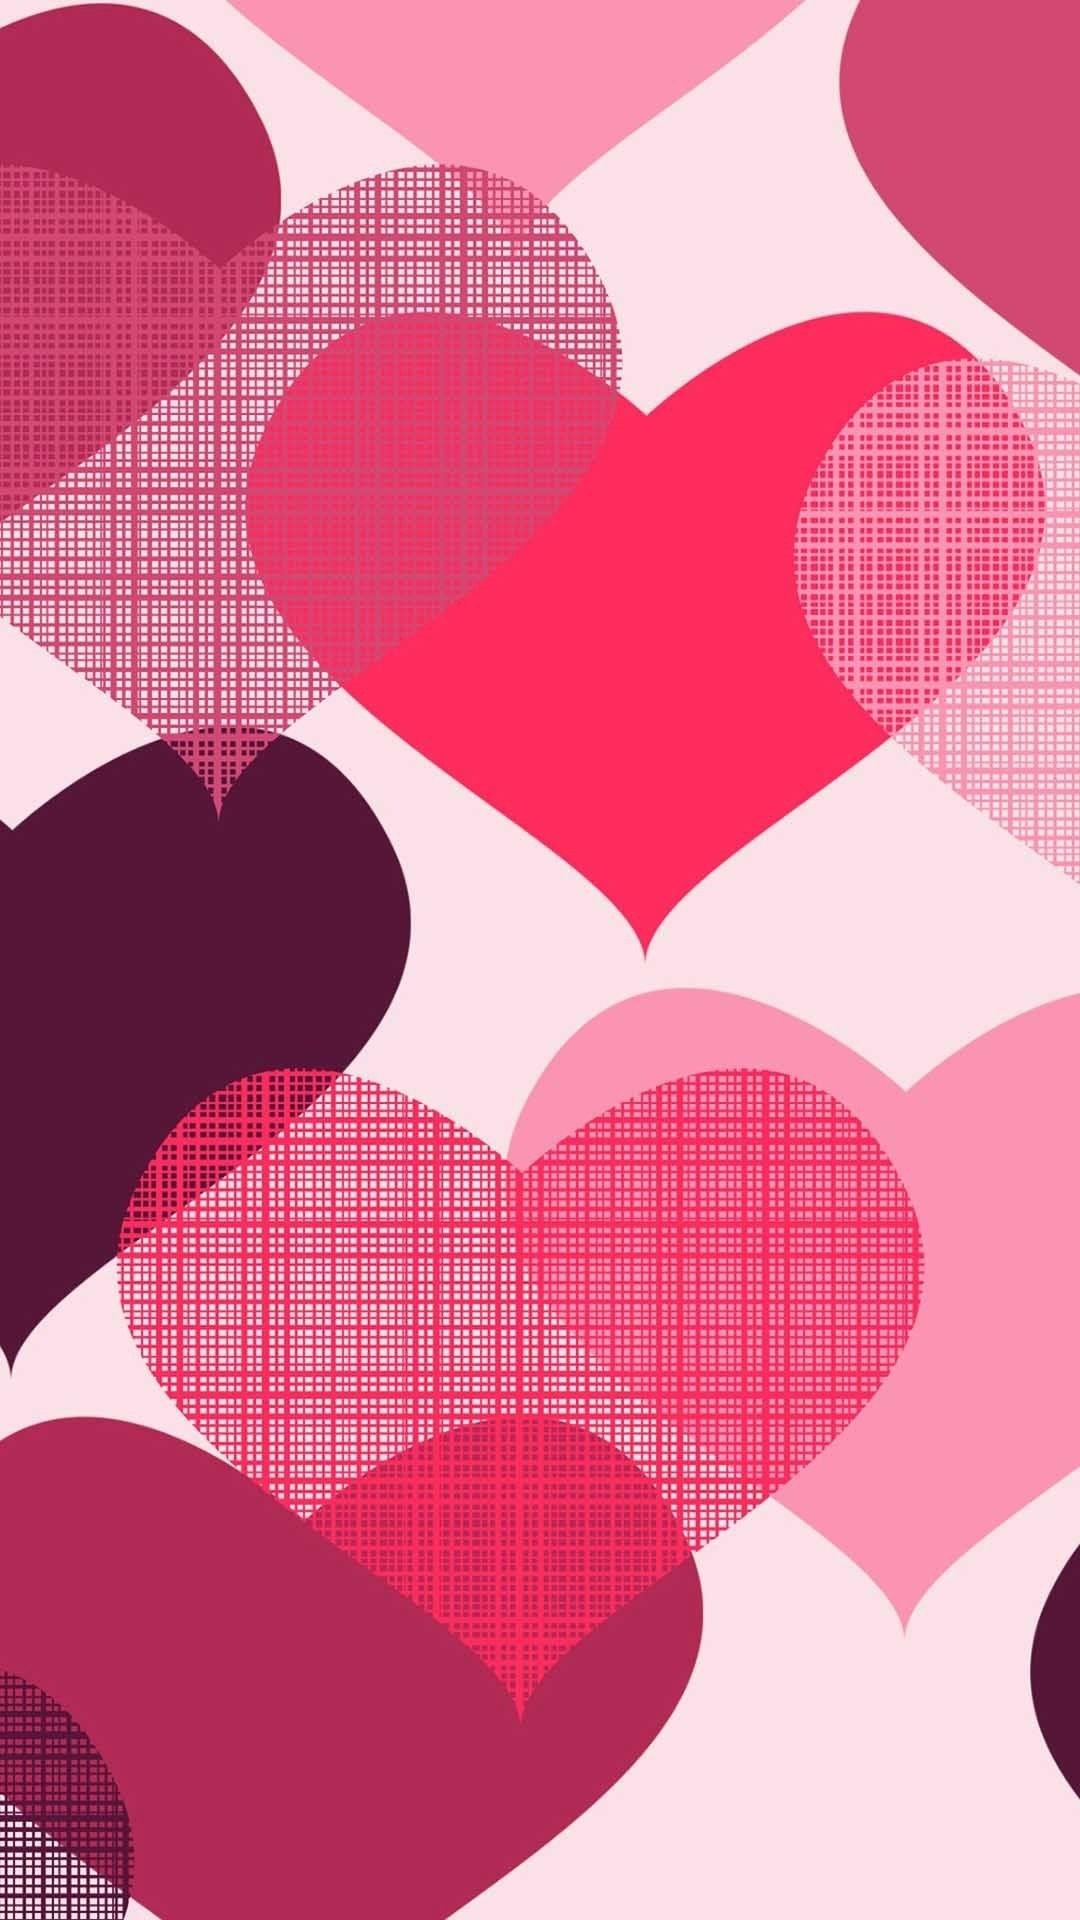 Valentines wallpaper iphone